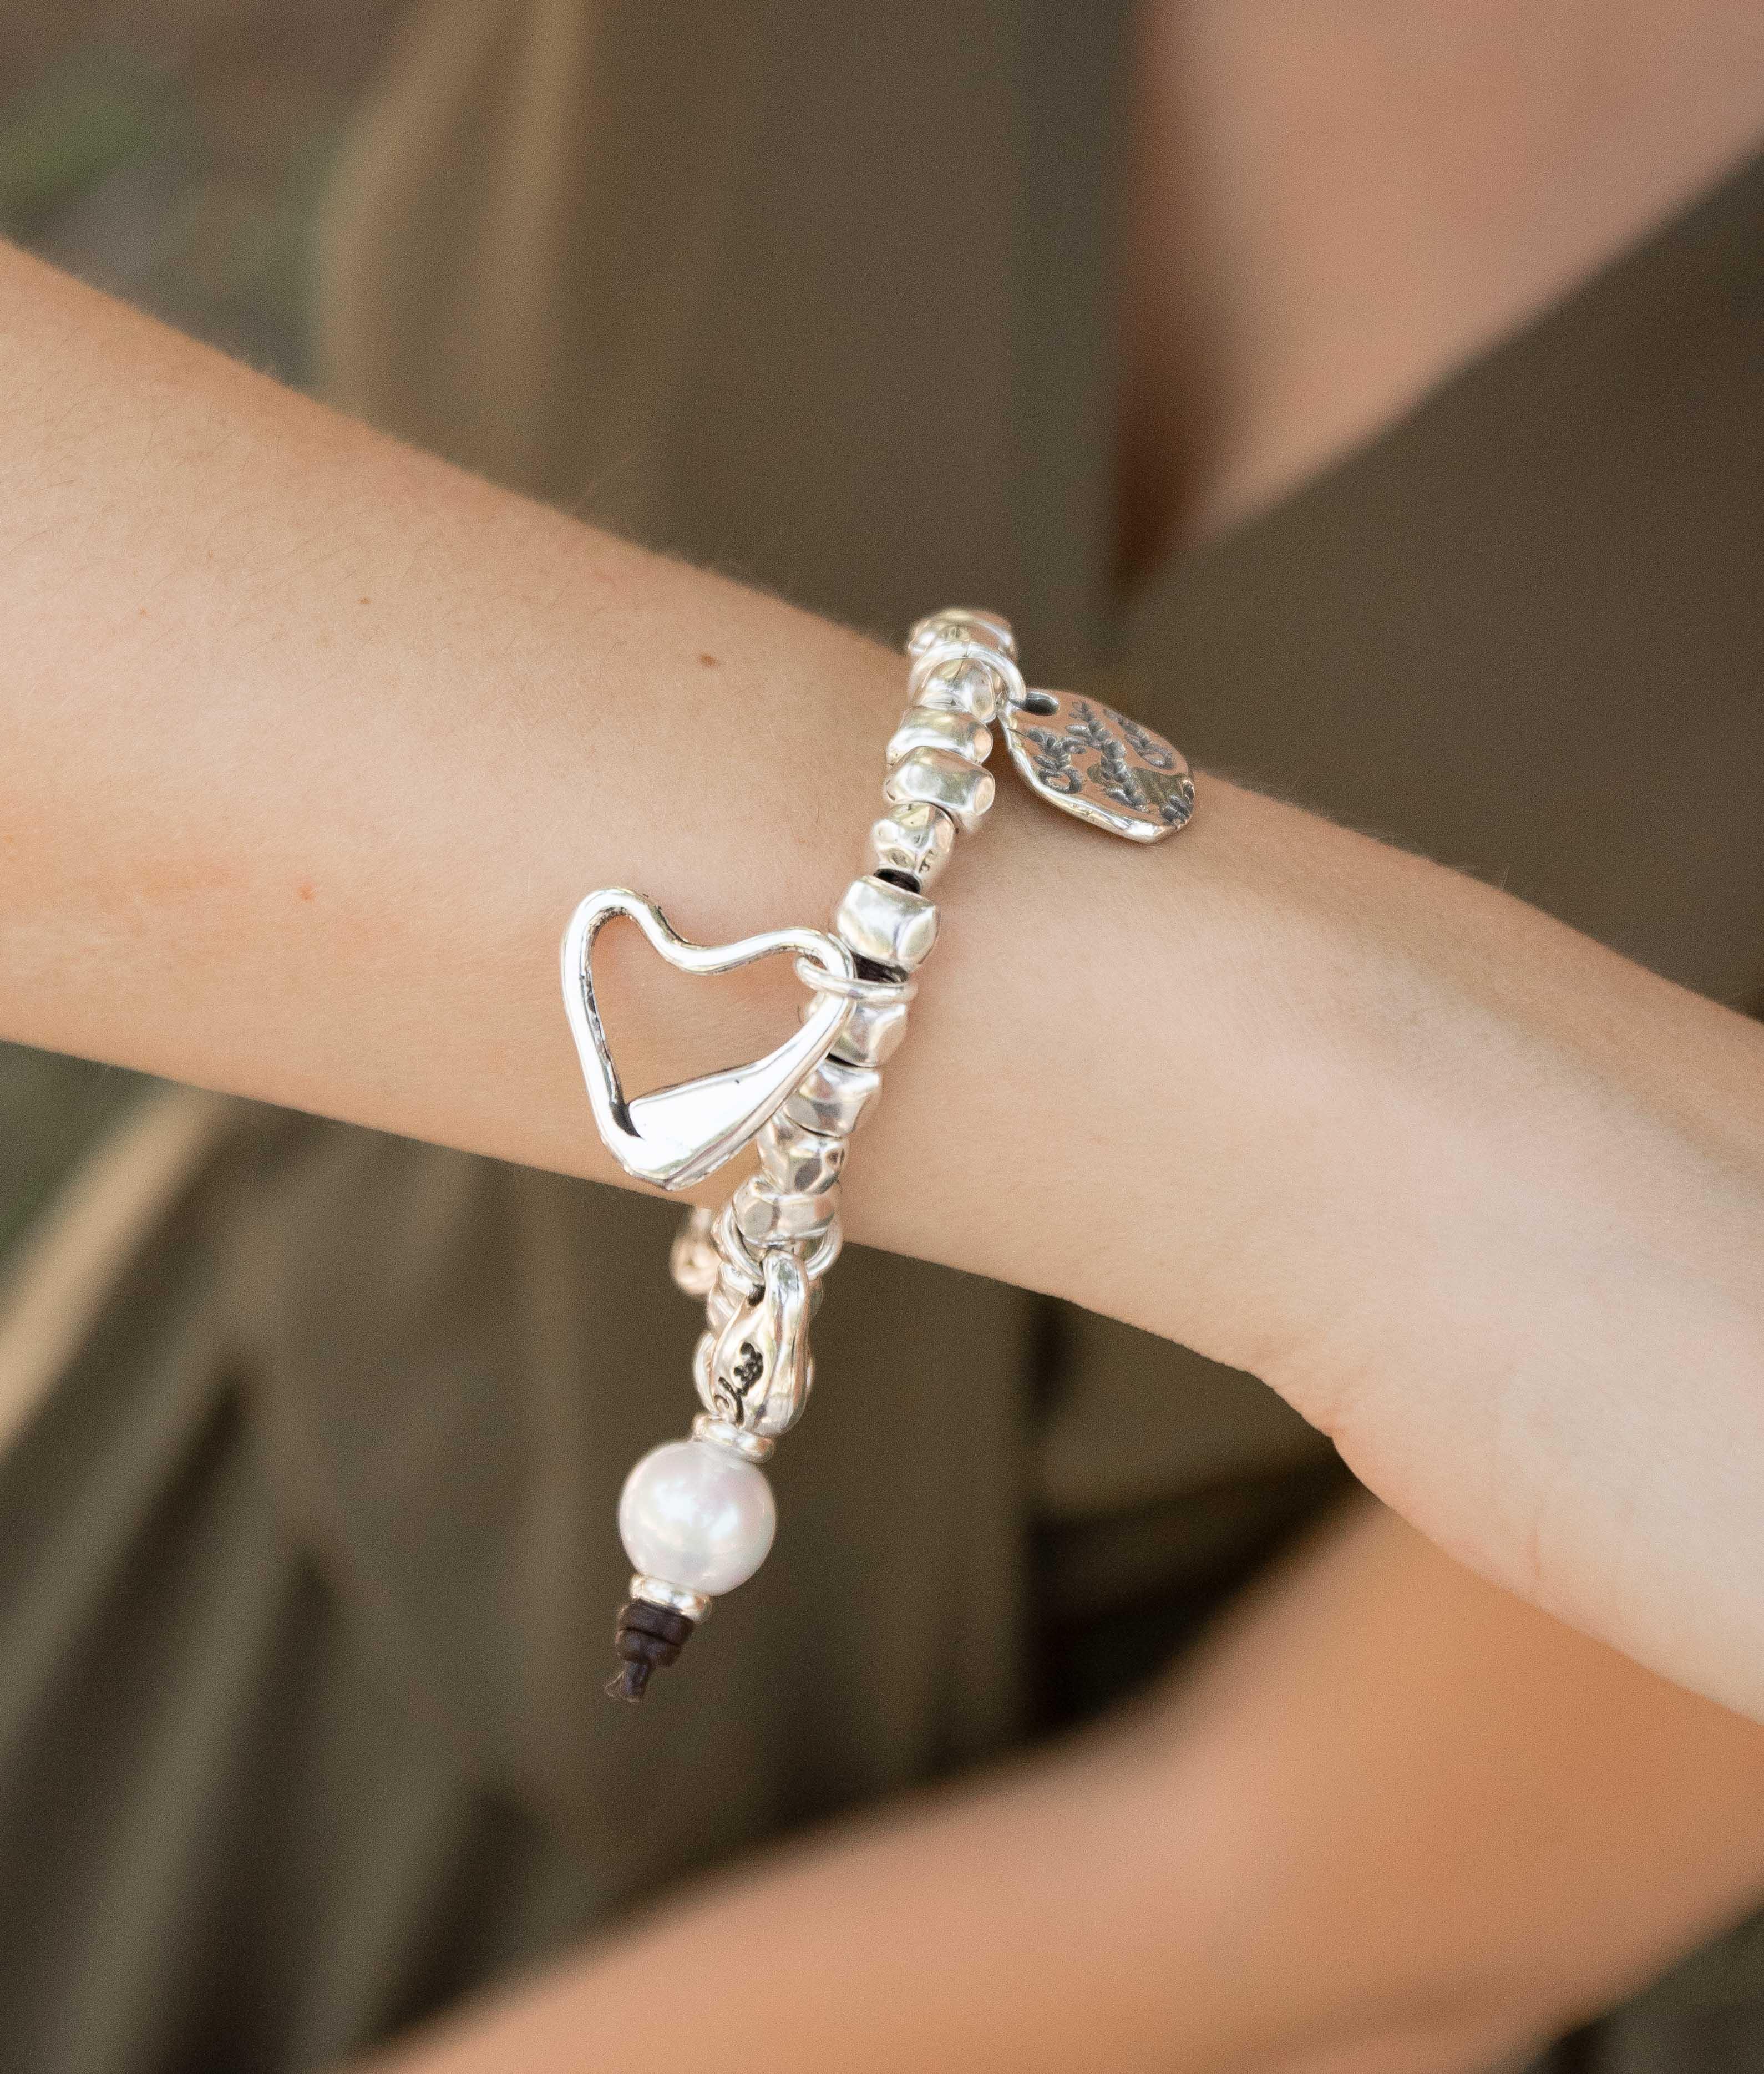 Bracelet X tu Pulpa - Silver